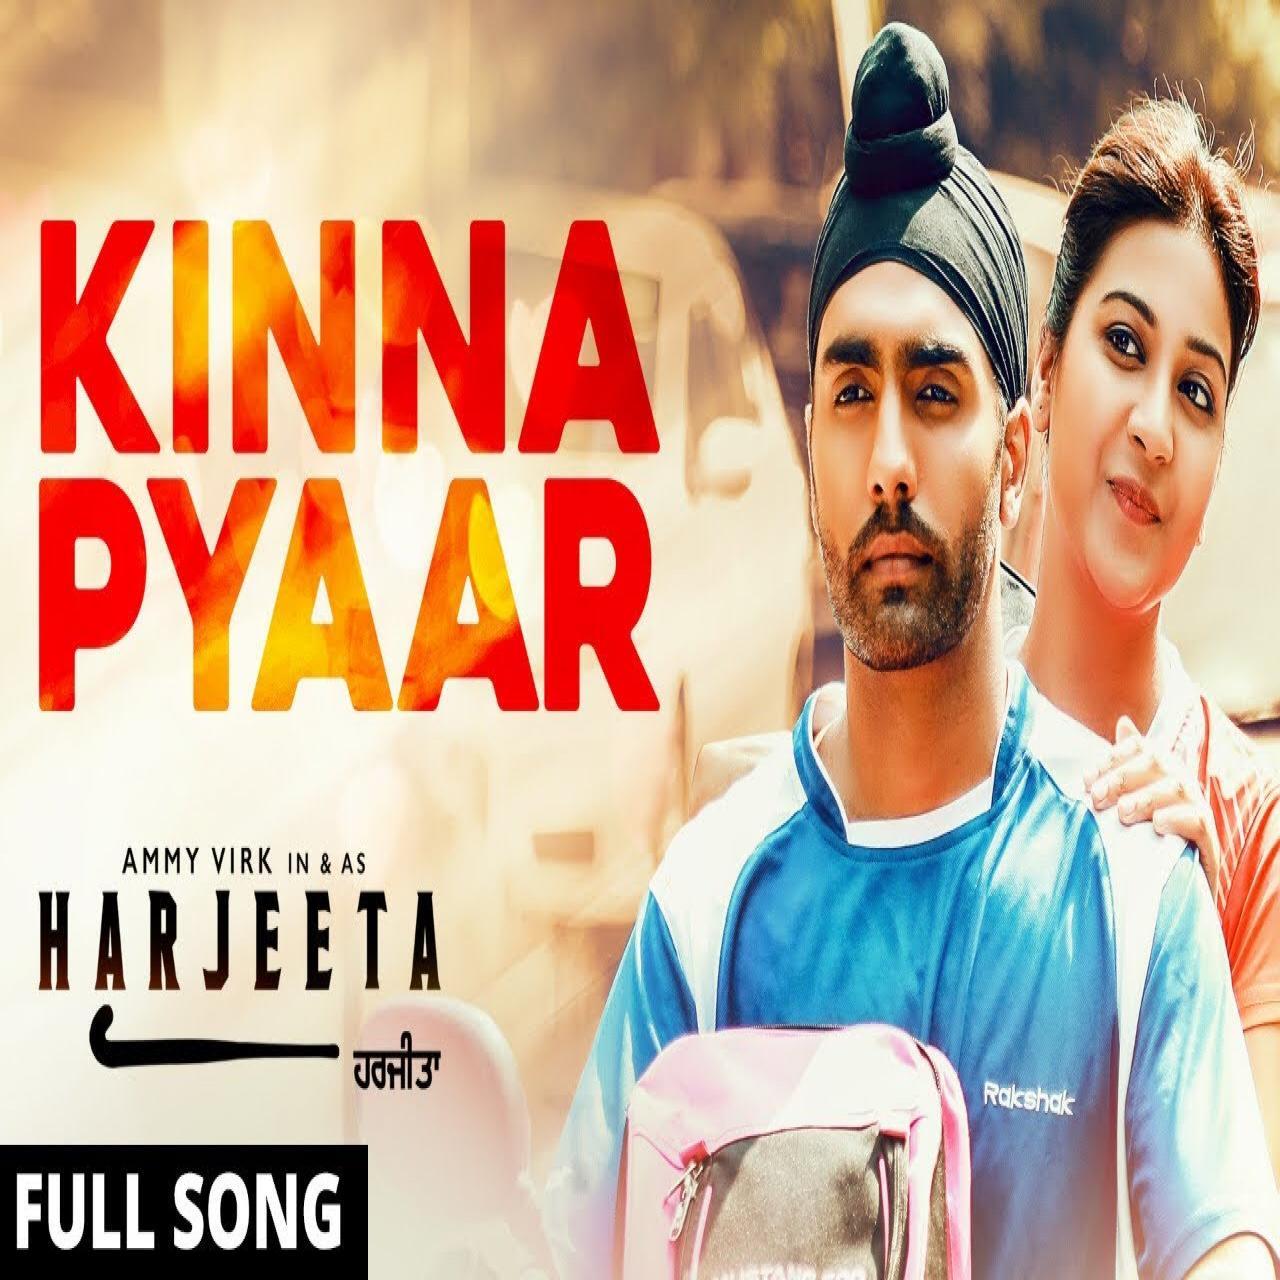 Kinna Pyaar album artwork